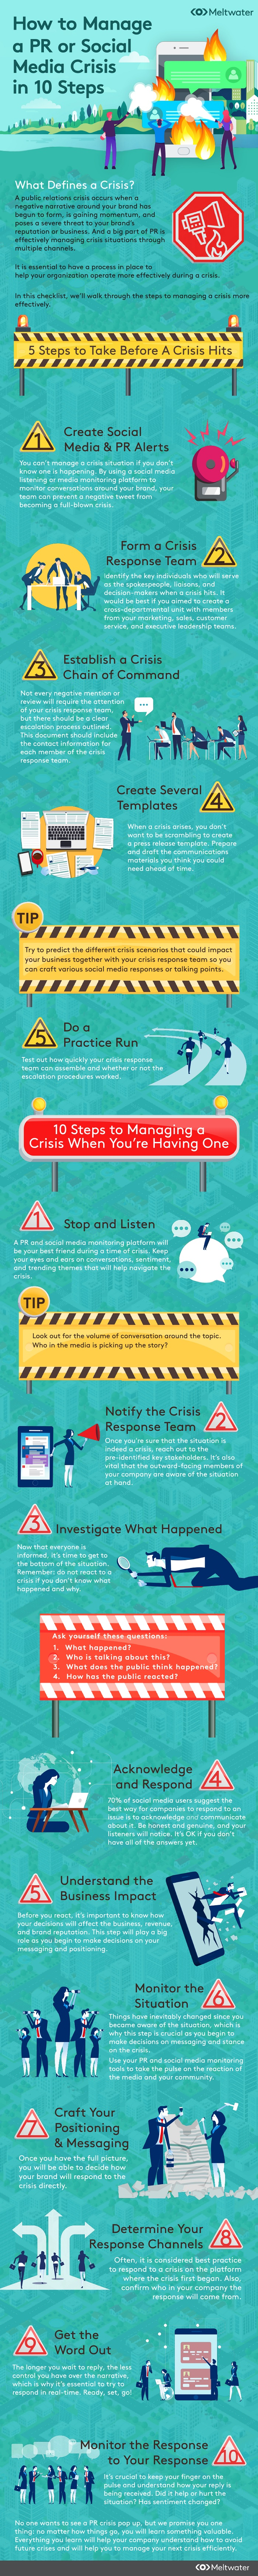 Social media crisis management tips